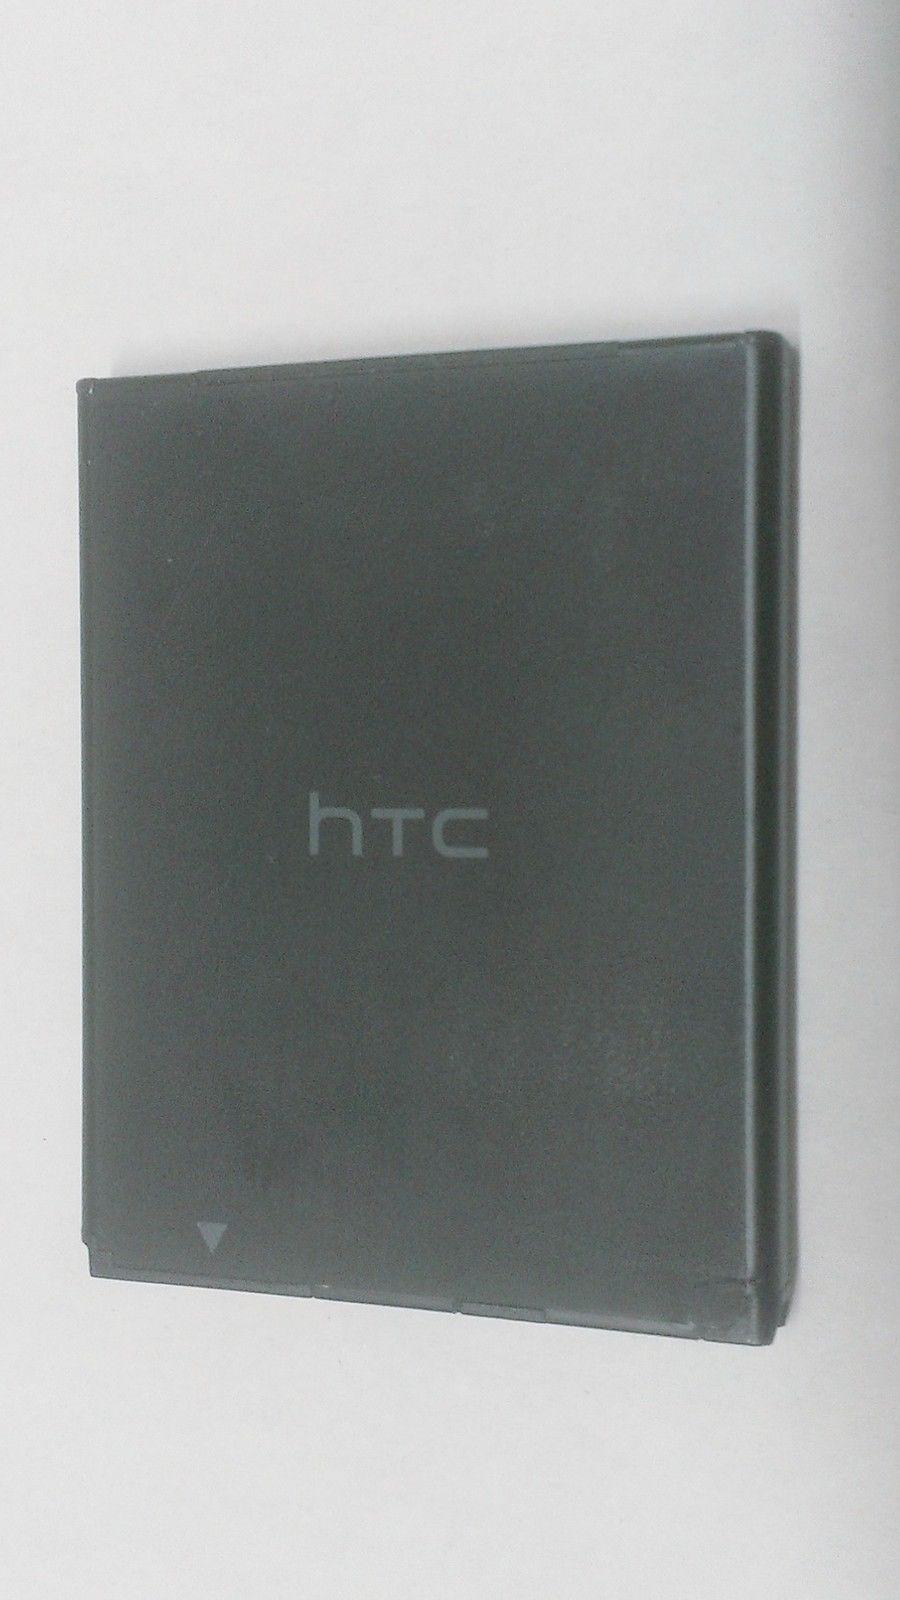 OEM HTC Merge BTR6325B Standard Battery 1400mAh 35H00142-05M  ADR6325 image 2